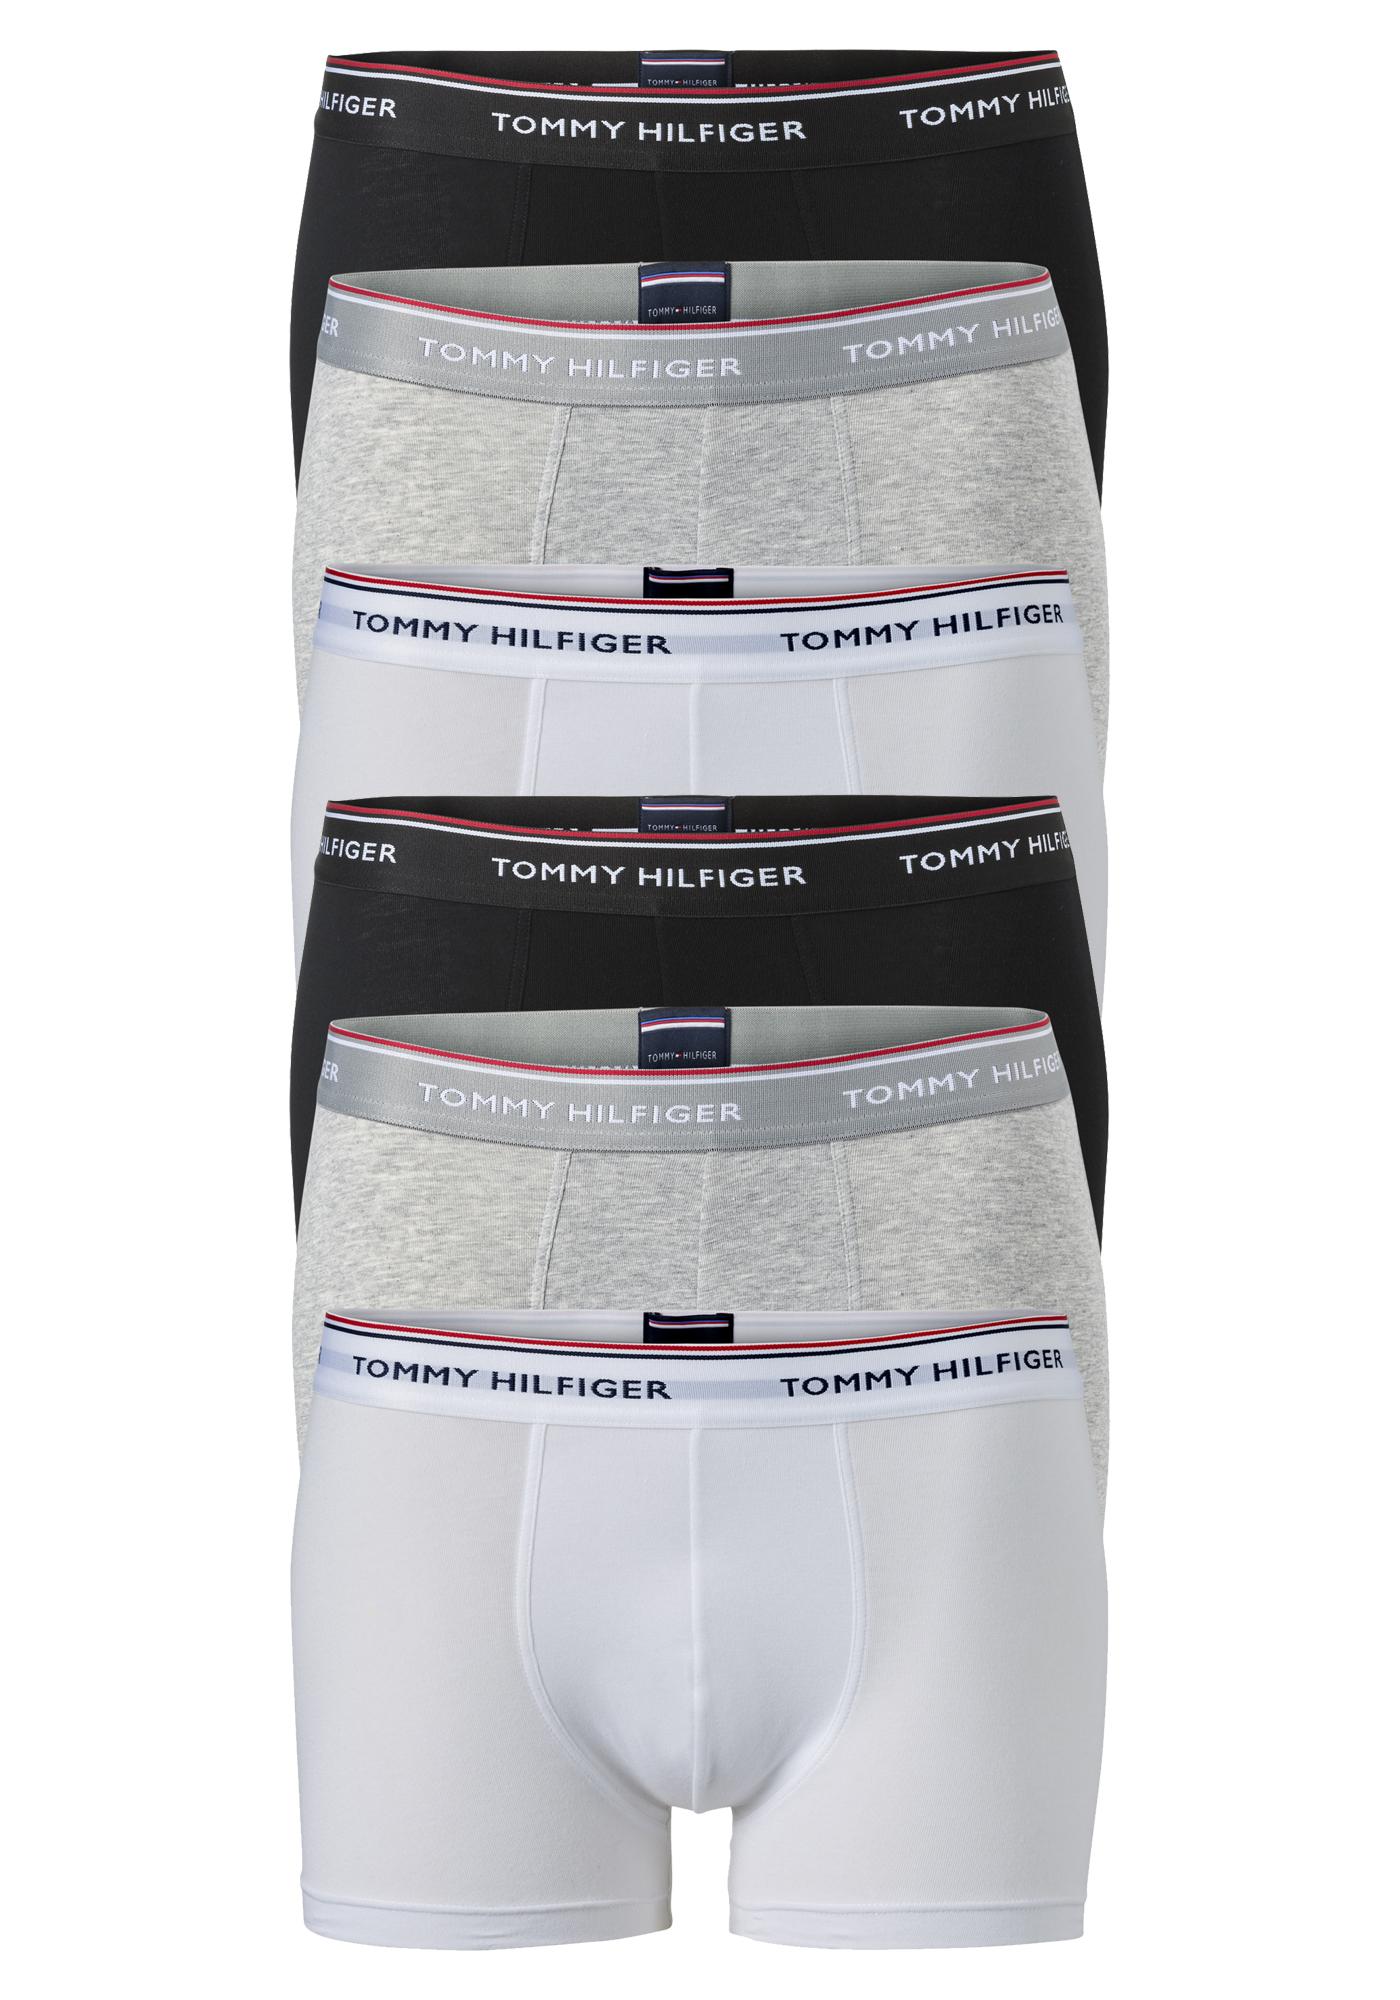 Actie 6 pack: Tommy Hilfiger boxershorts, zwart wit en